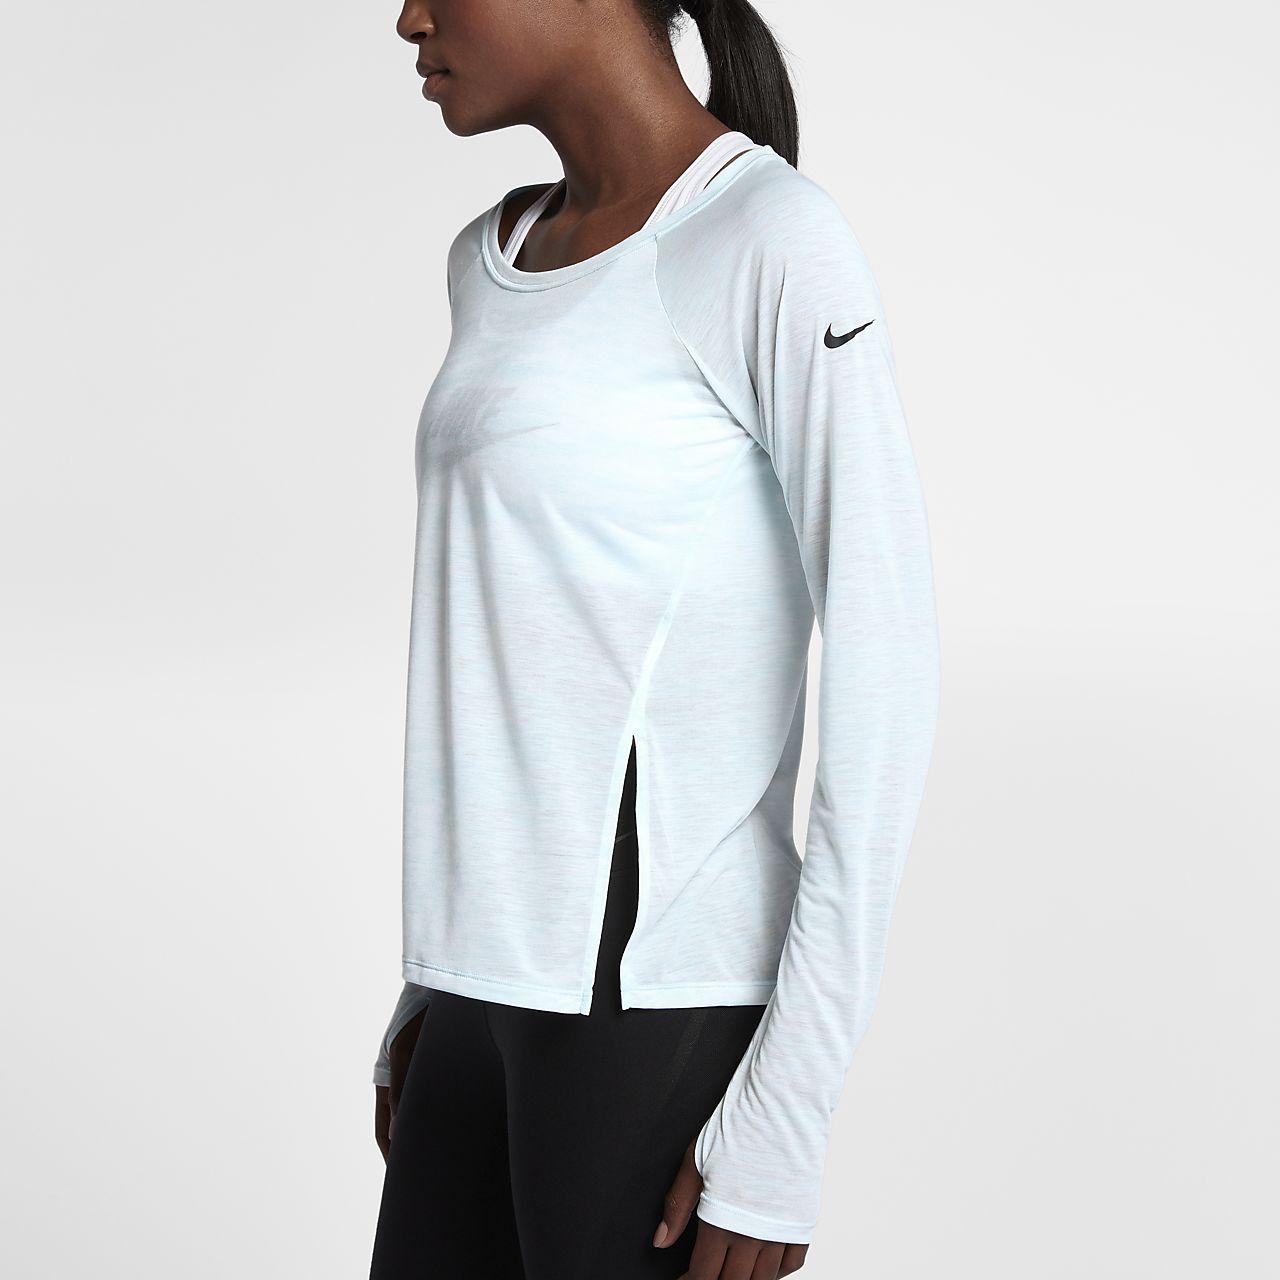 ... Nike Breathe Women's Long Sleeve Training Top